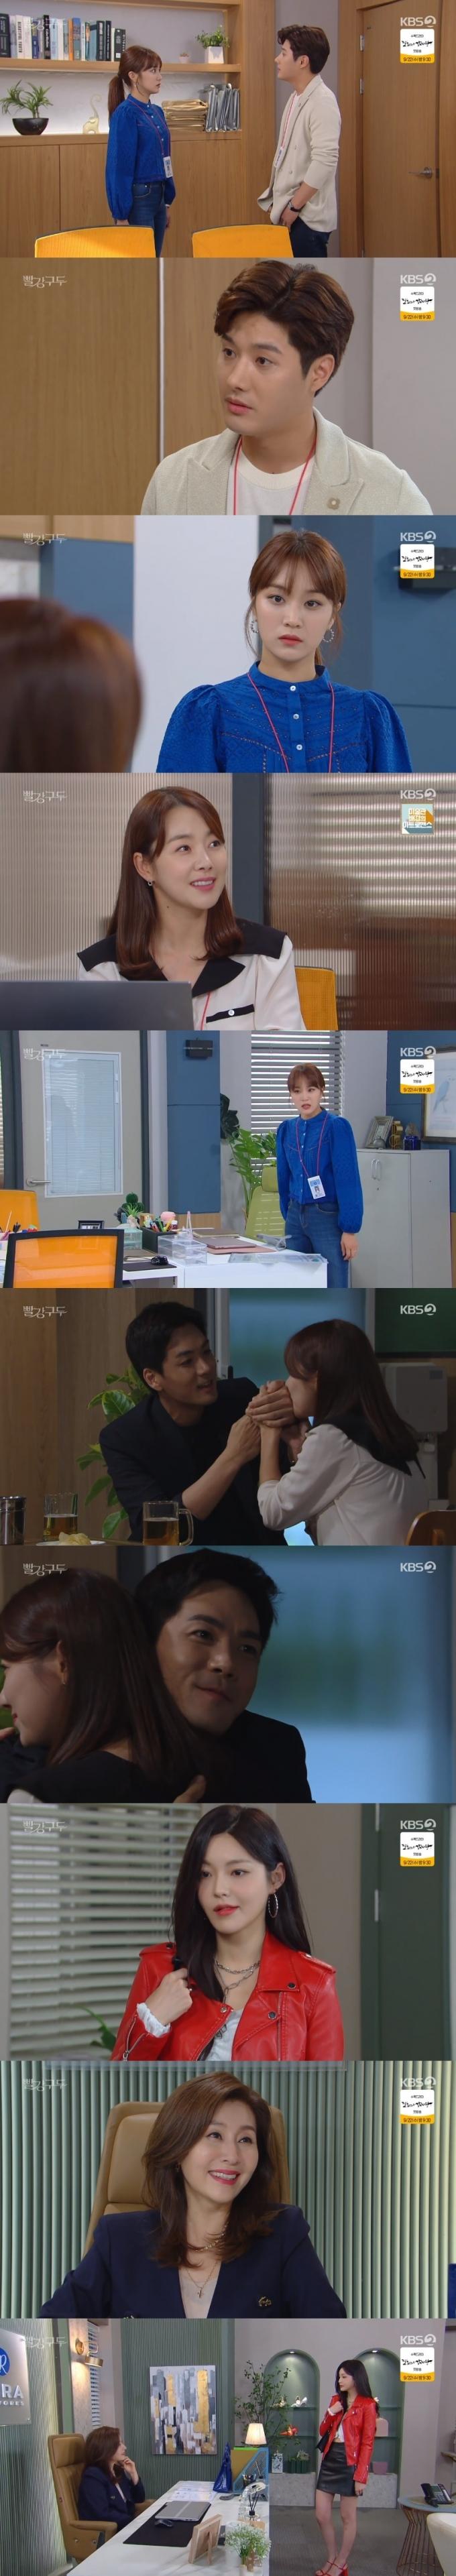 KBS 2TV '빨강 구두' 캡처 © 뉴스1